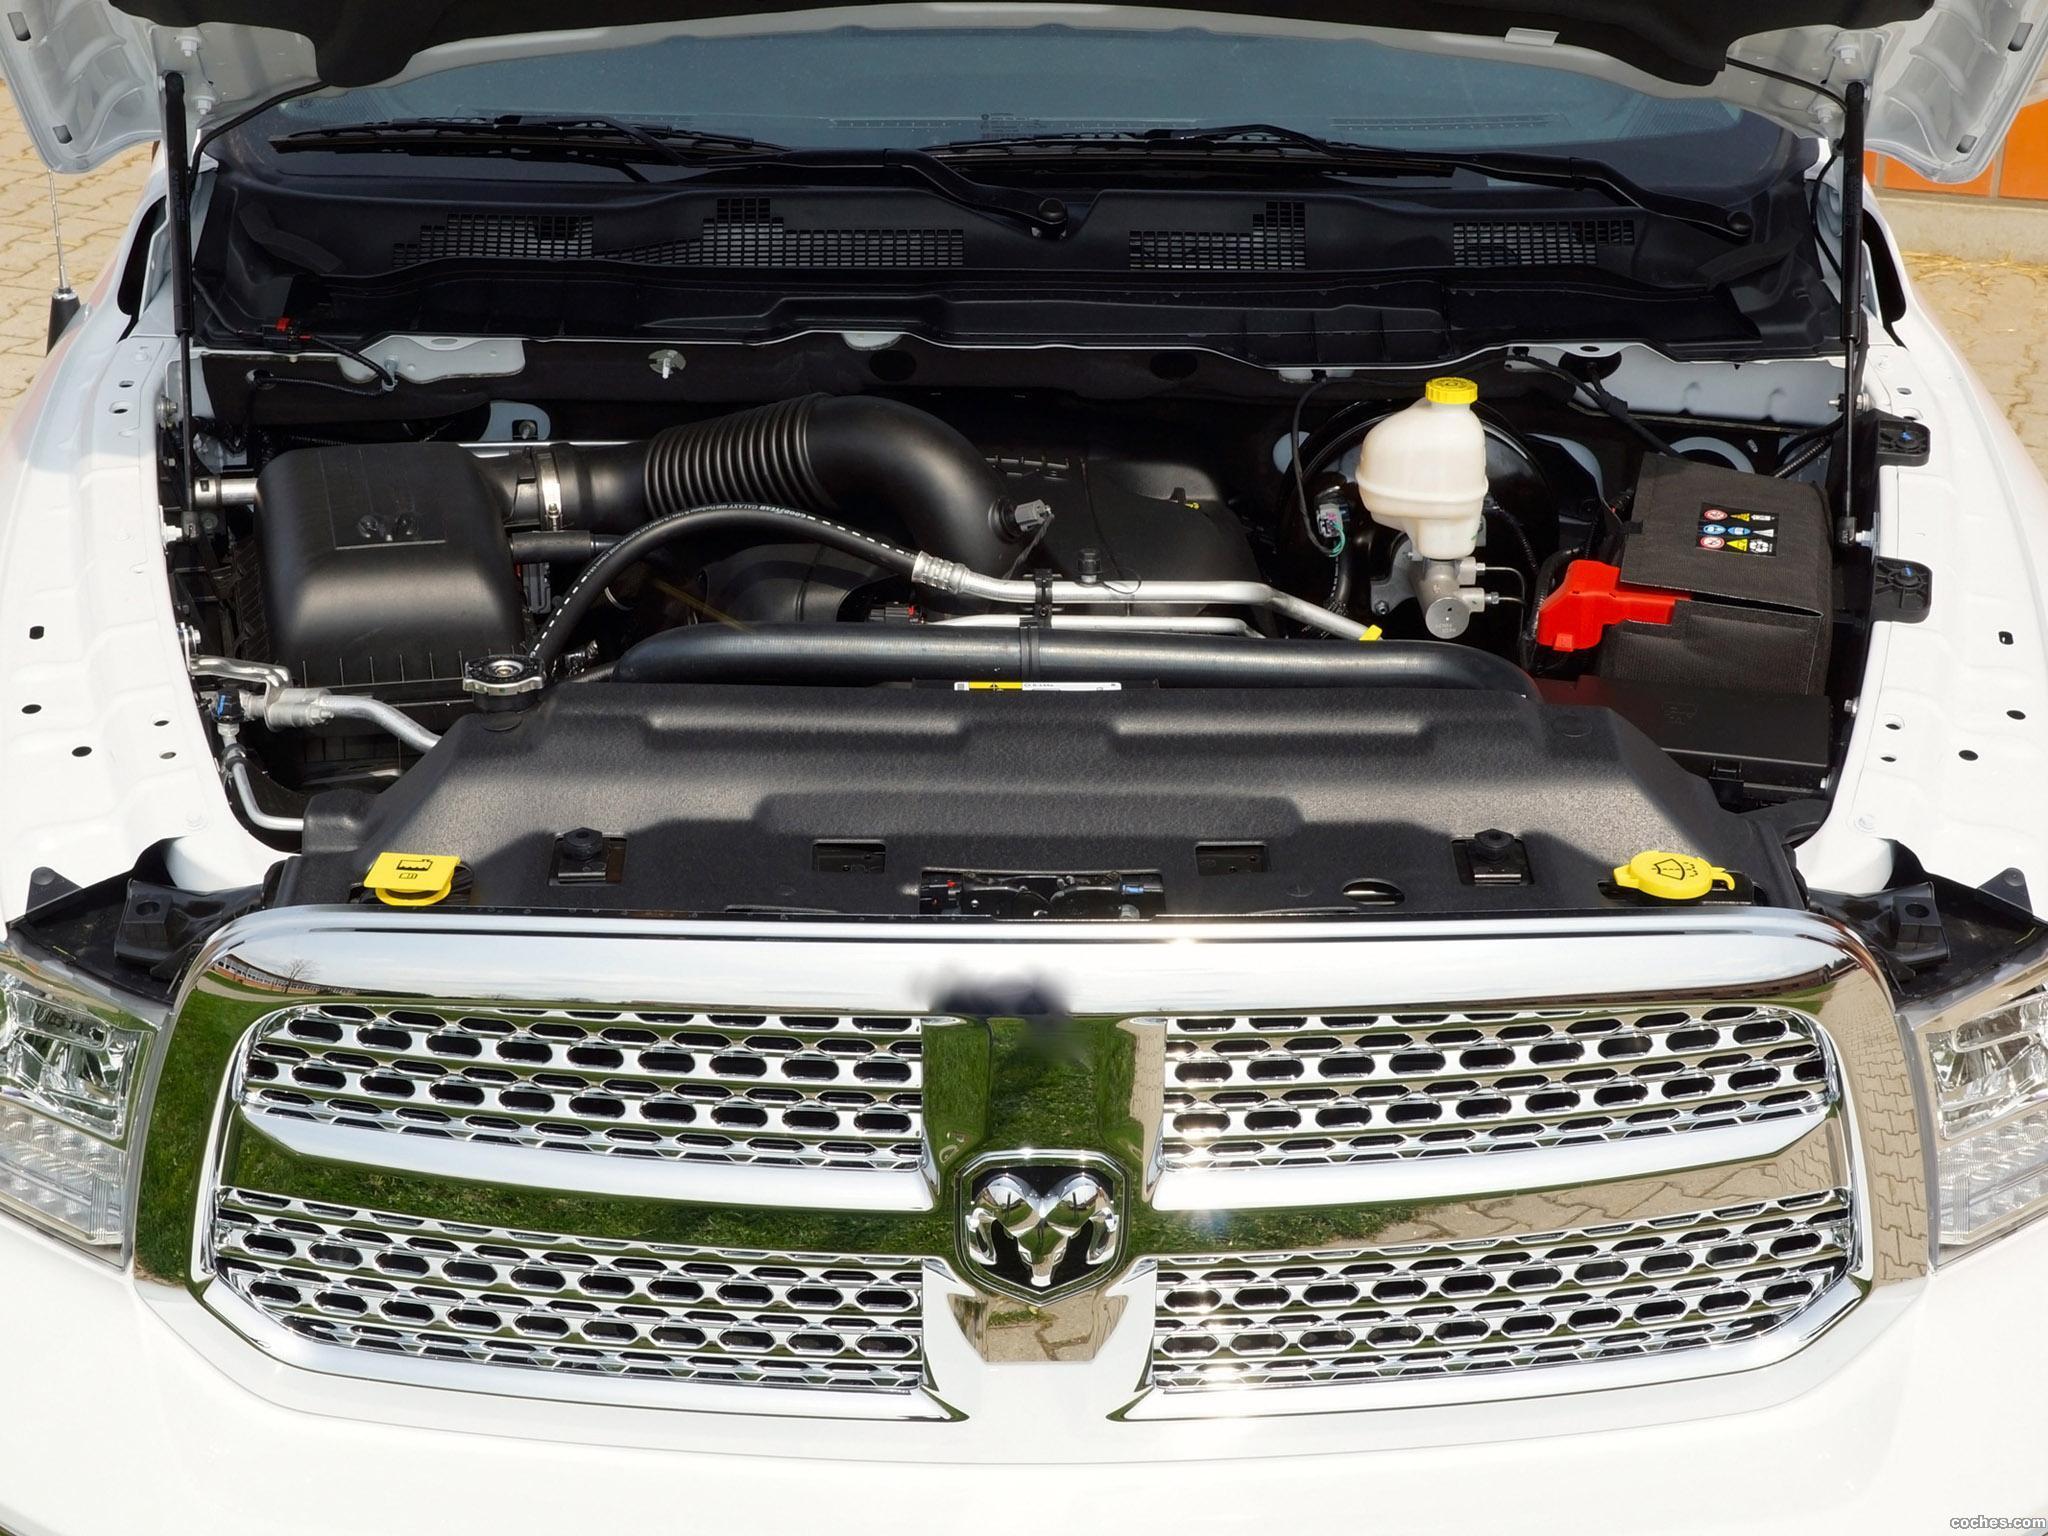 Foto 13 de Geiger Dodge Ram 1500 2013